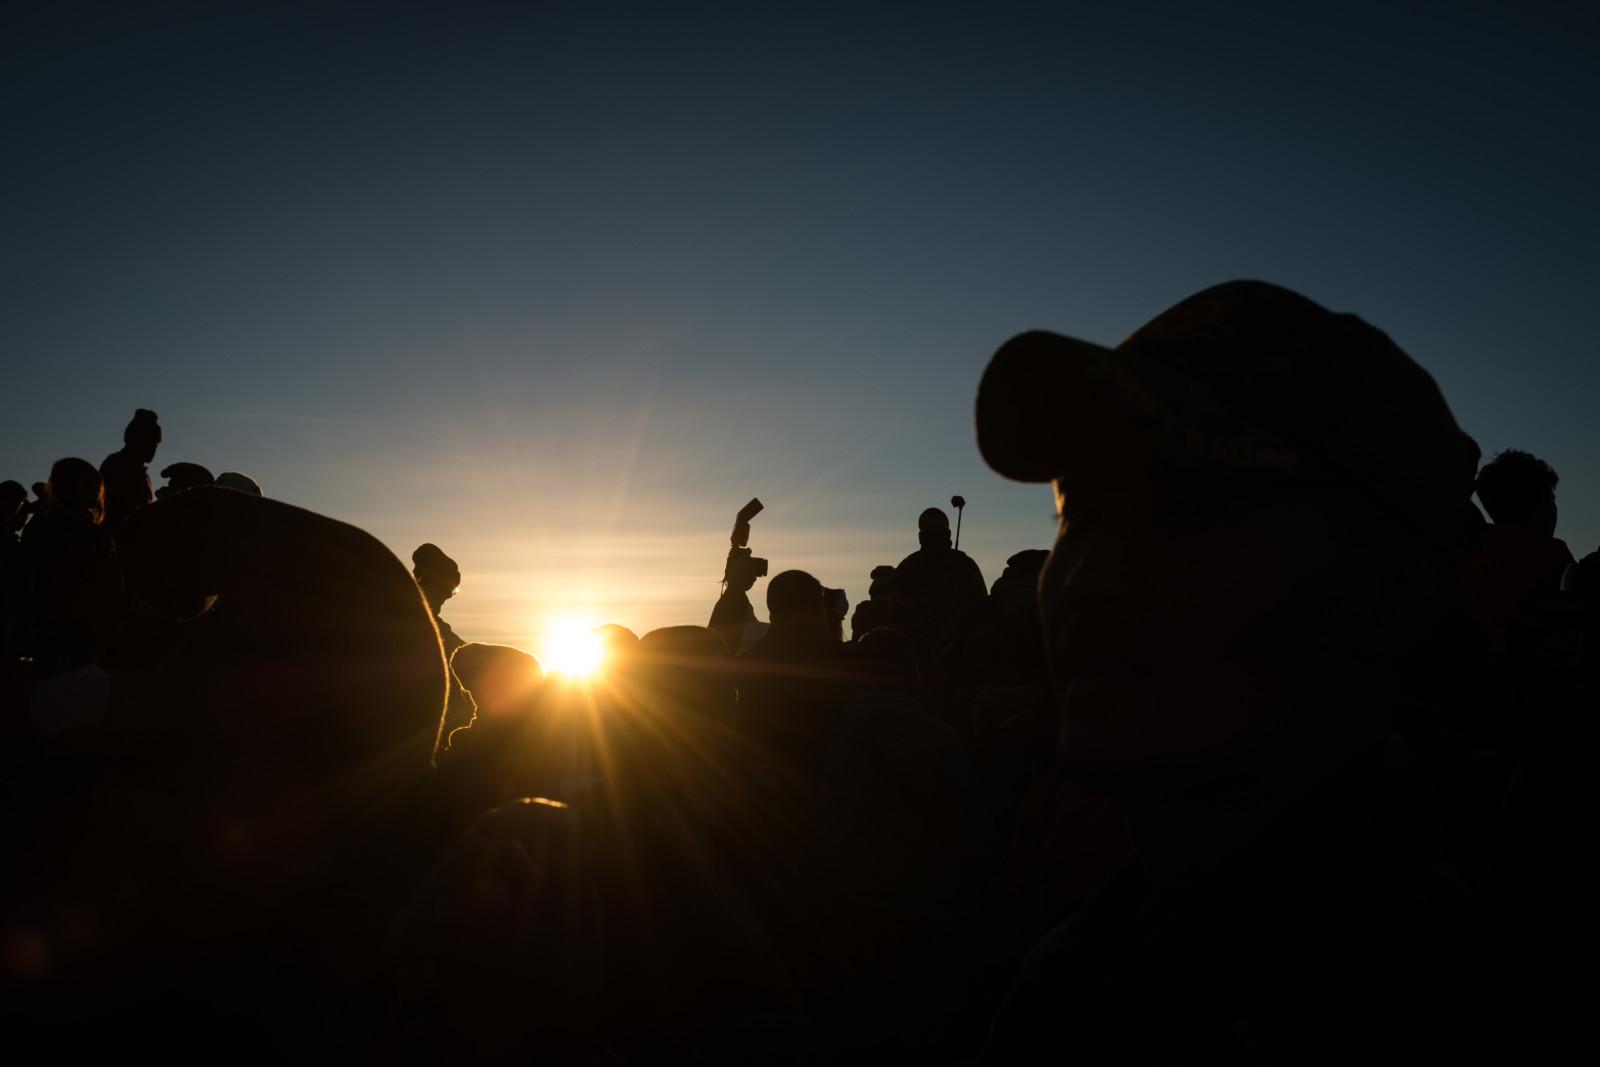 Bromo Silhouette - Bromo LQ